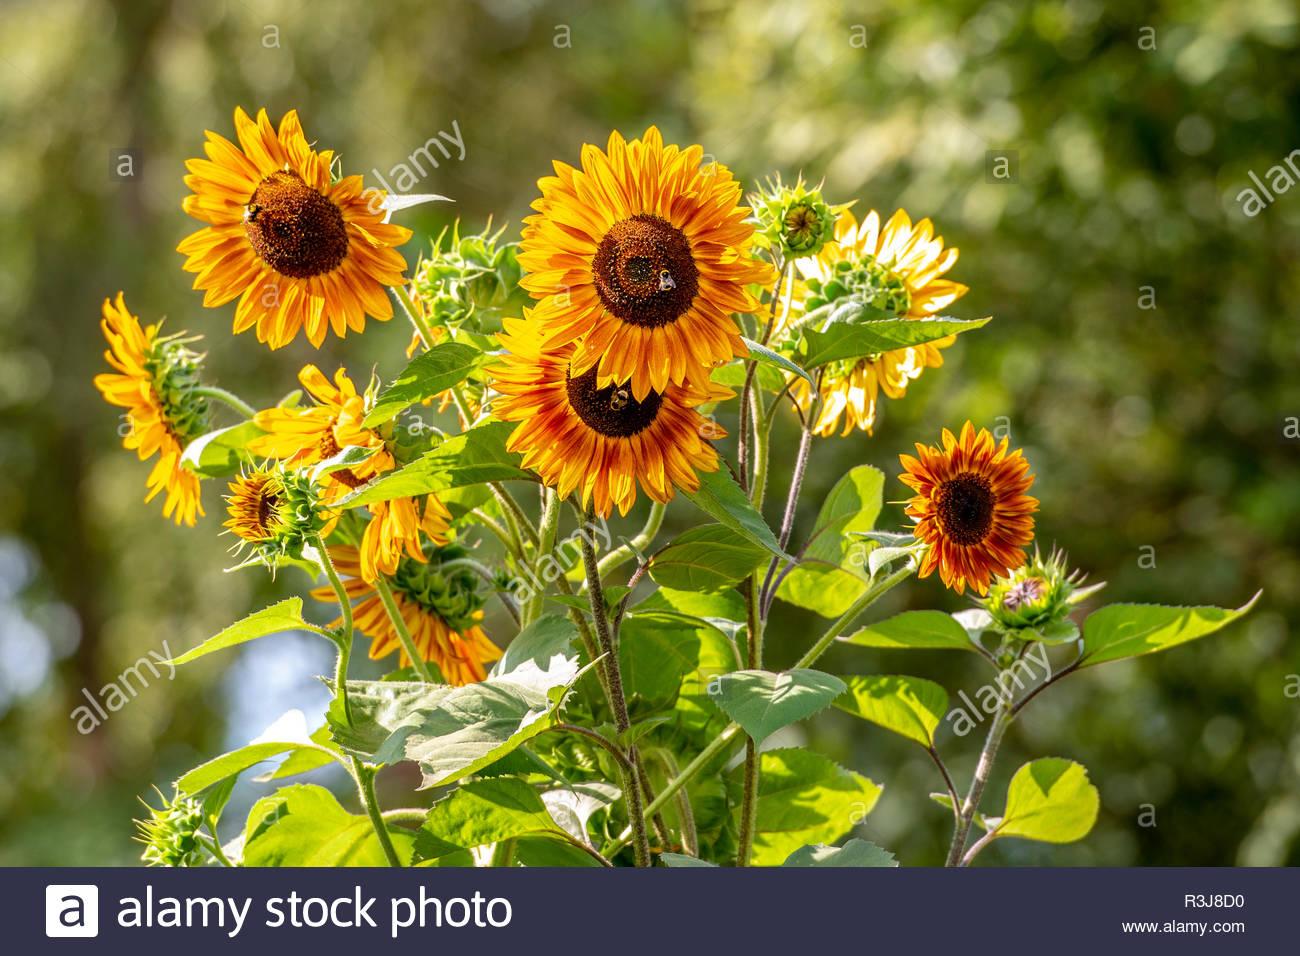 Sonnenblumen in der Sommersonne - Stock Image